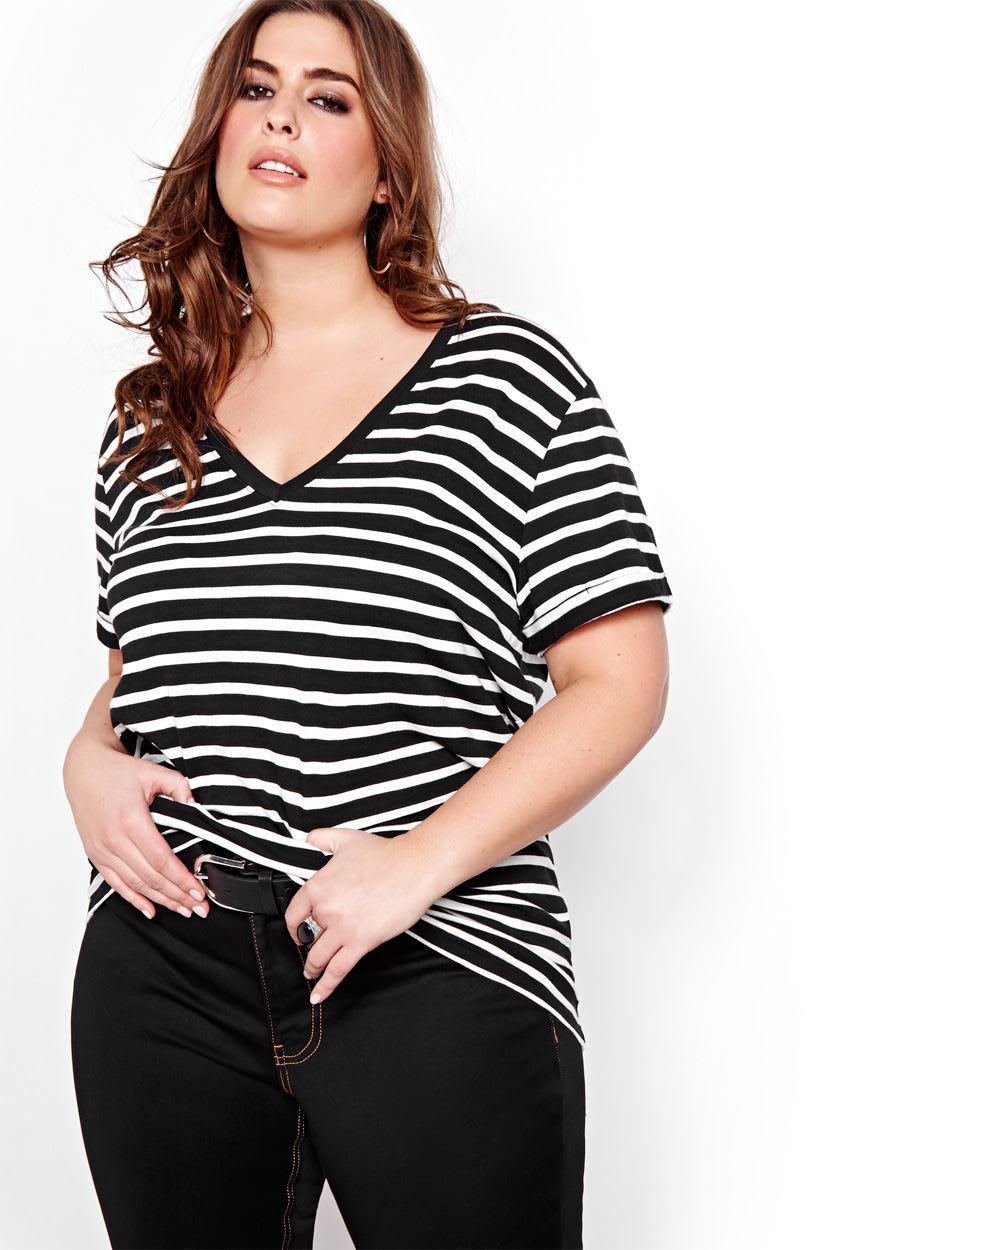 417685ac15c Lyst - Addition Elle L l Striped Boyfriend T-shirt in Black